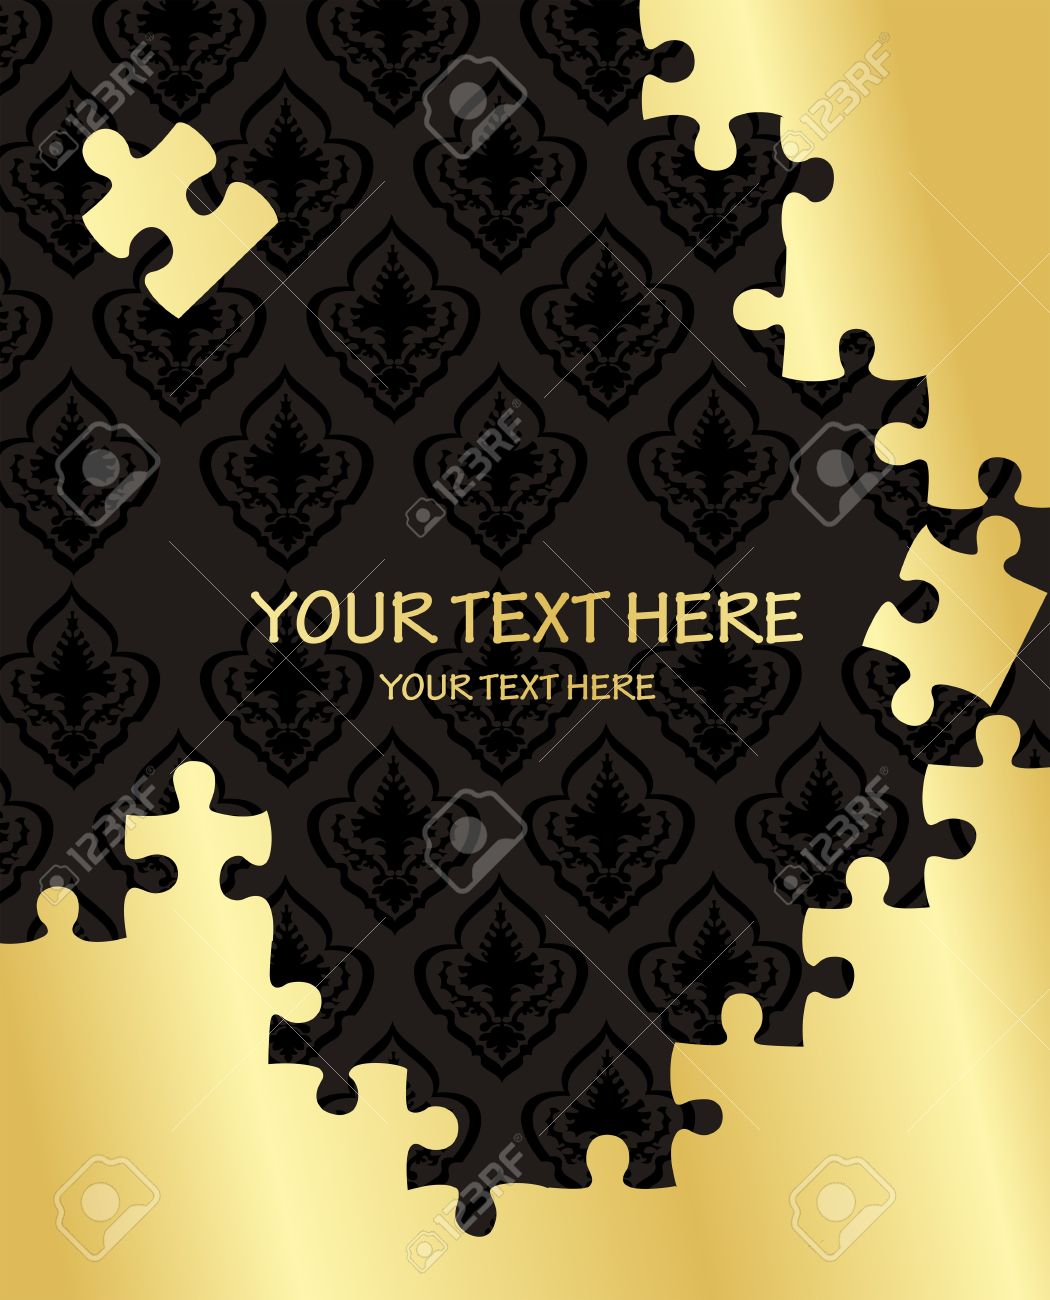 Vintage jigsaw puzzle elements illustration Stock Vector - 10351397